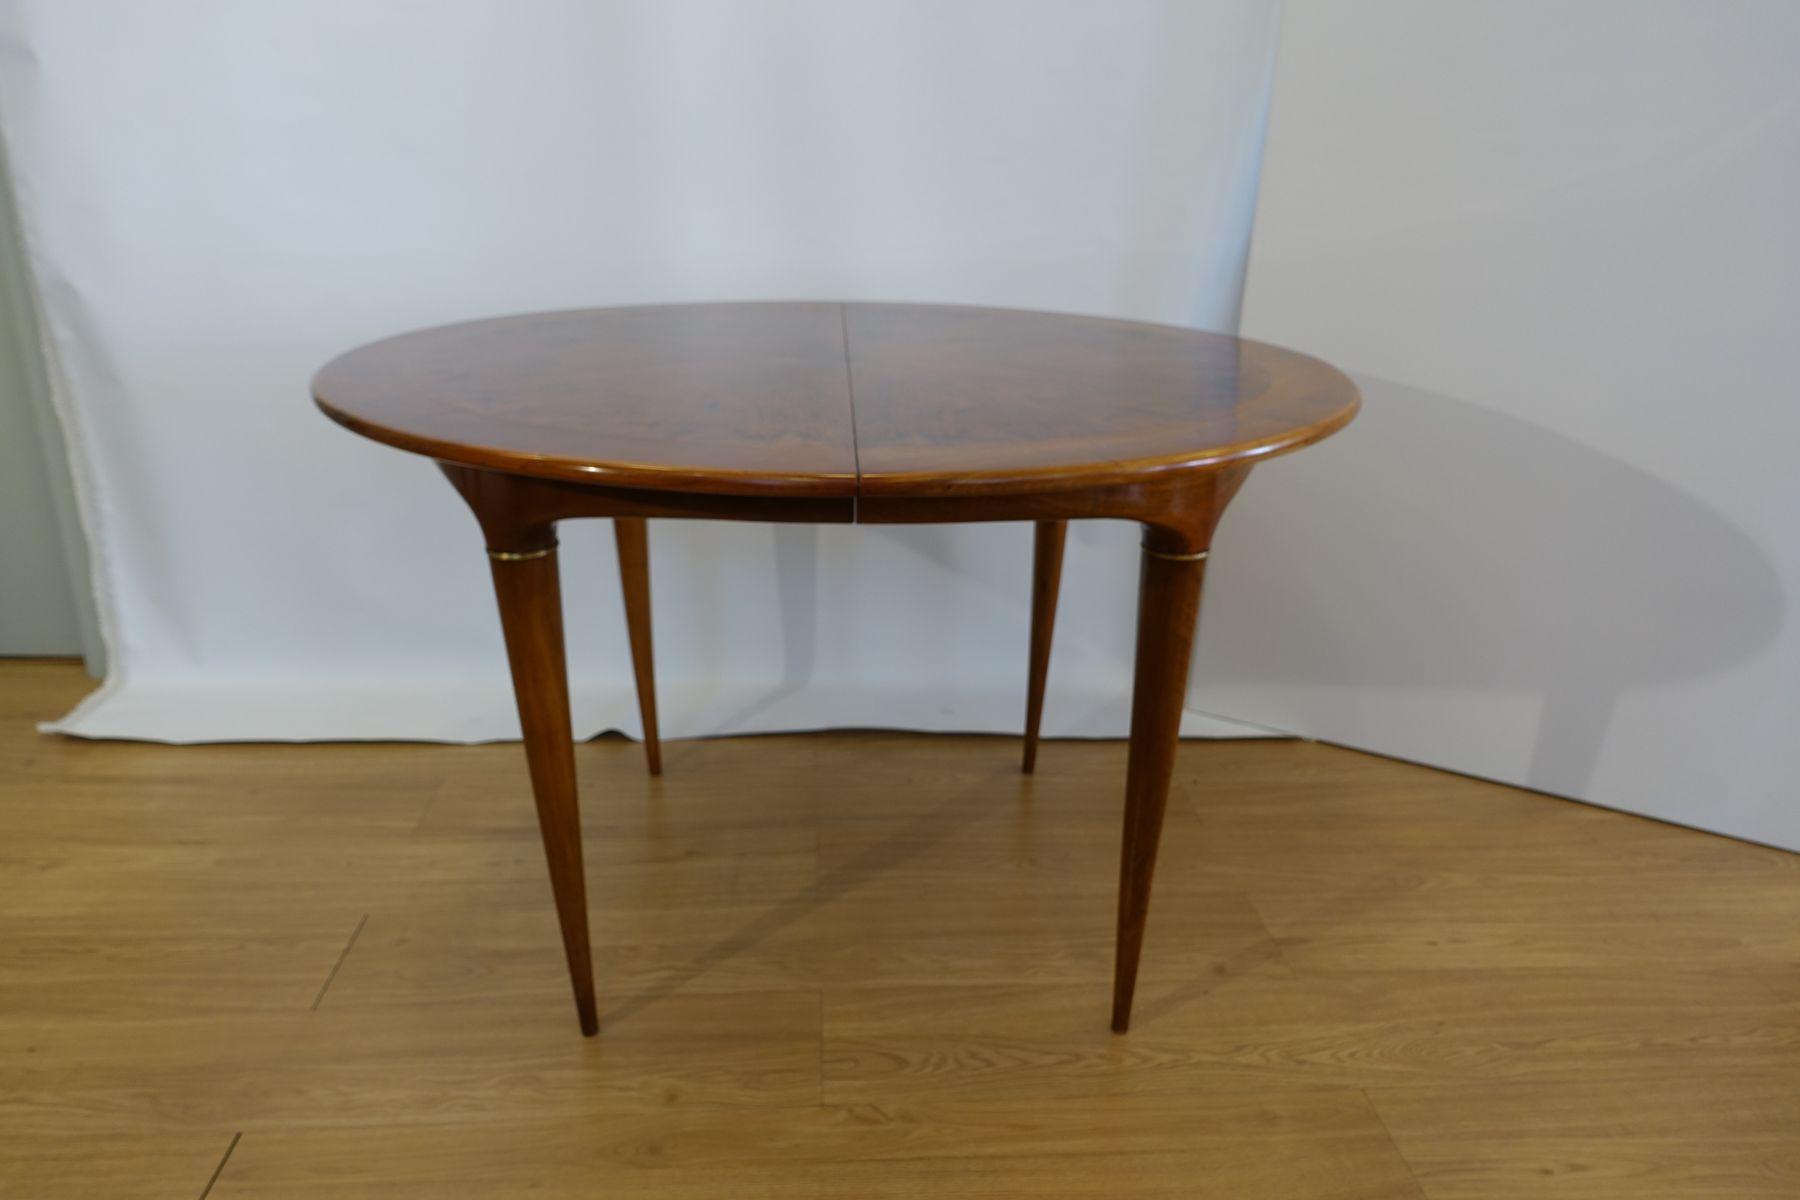 Round walnut dining table by jos cruz de carvalho for altamira round walnut dining table by jos cruz de carvalho for altamira 1950s dzzzfo